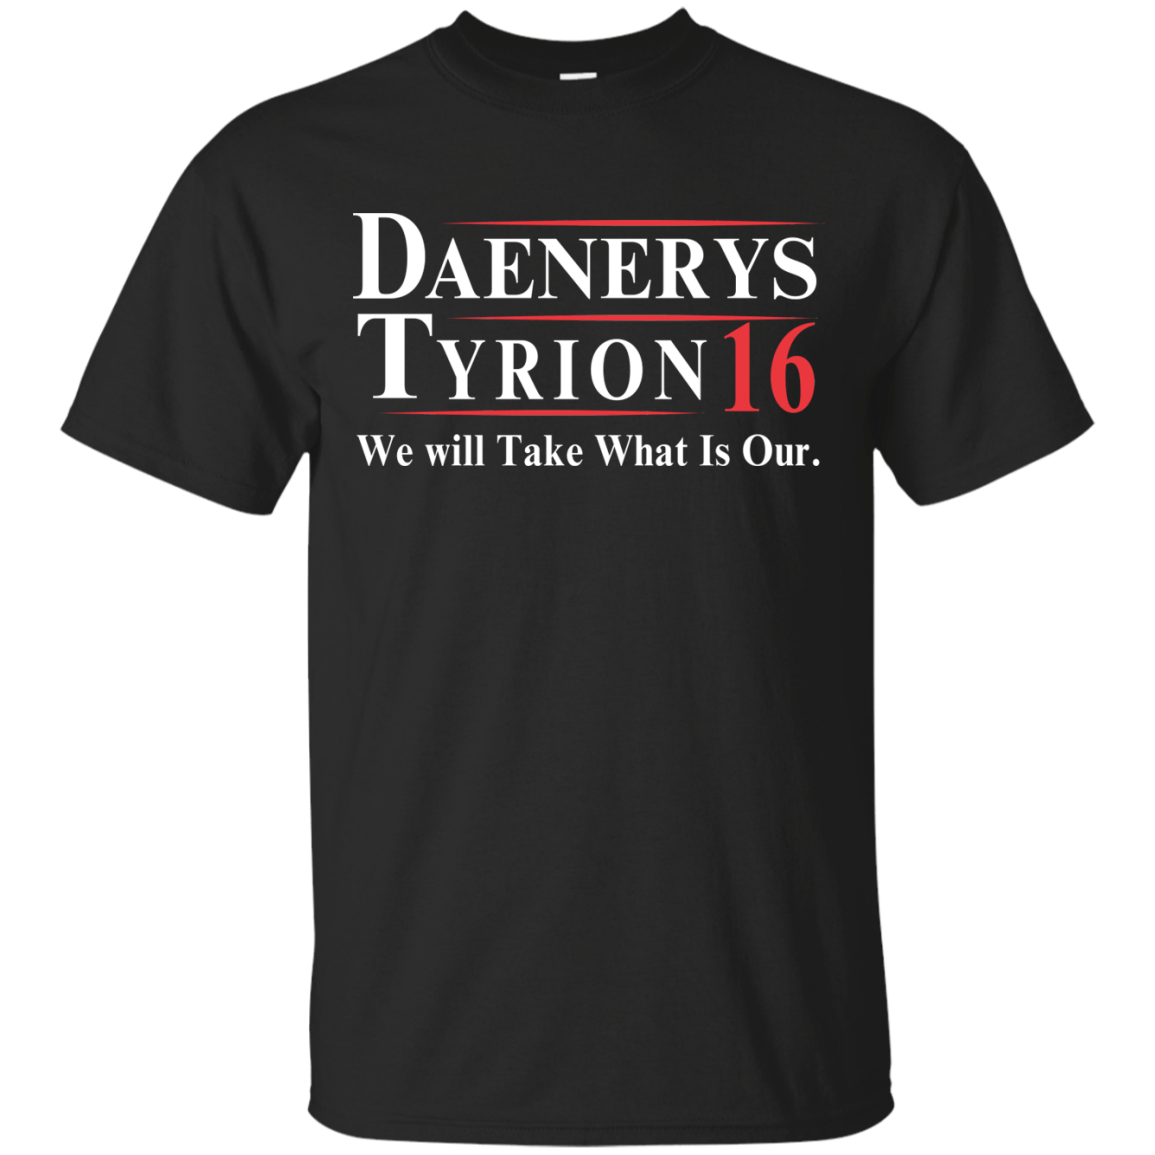 Daenerys Tyrion for president 2016 t shirt & hoodies